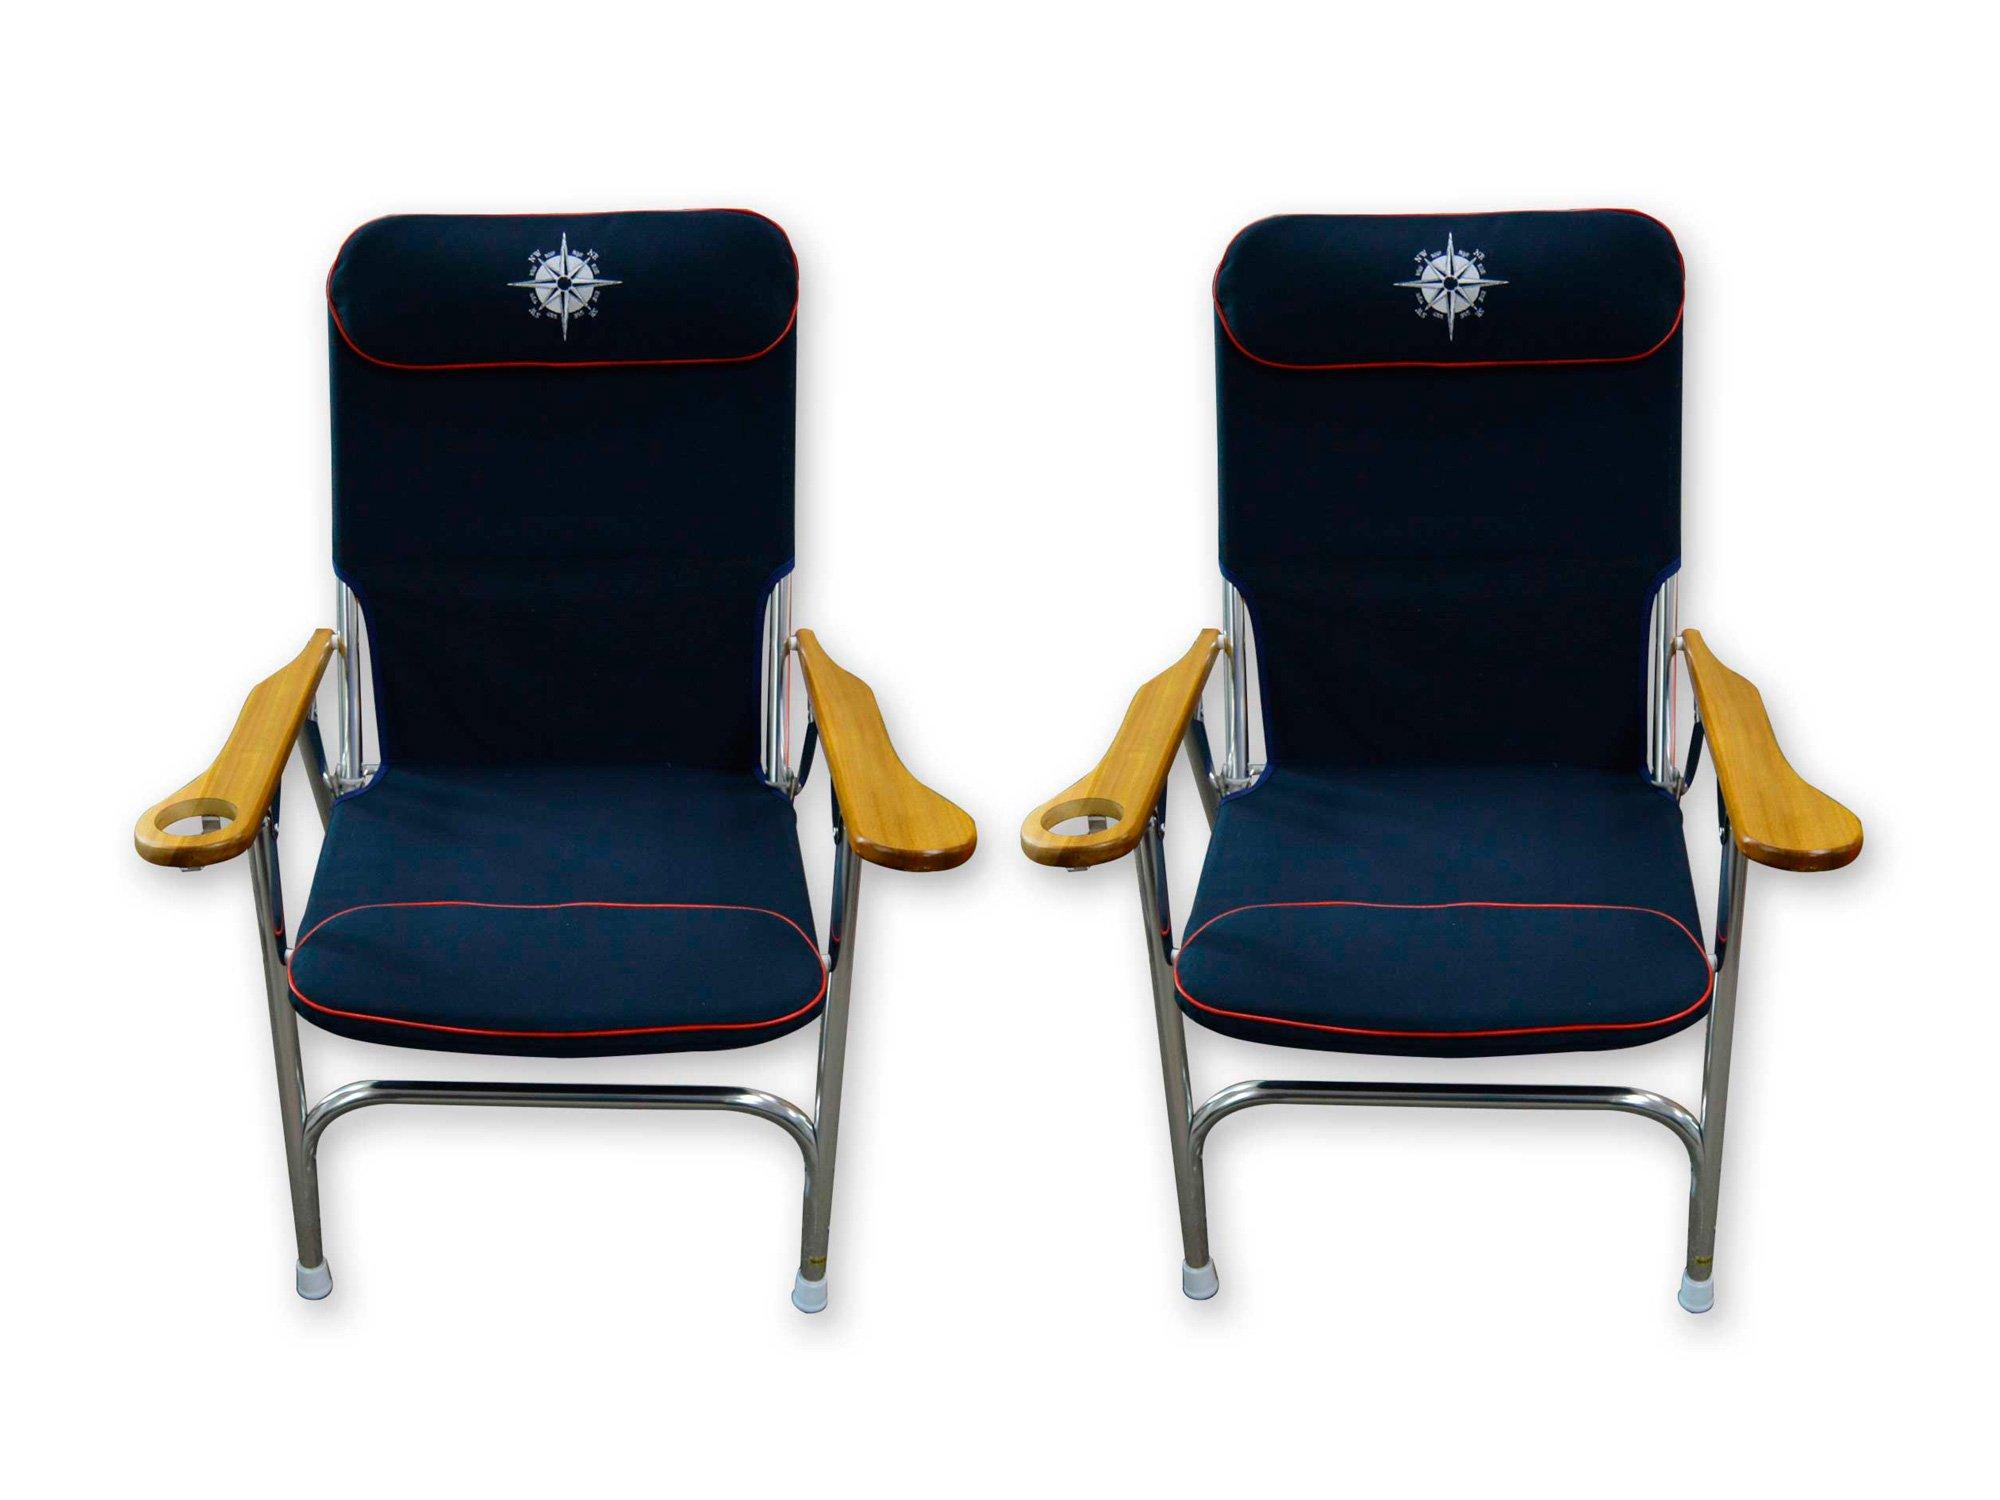 Five Oceans Navy Blue Skipper Deck Chair (Set of 2) - BC 3884